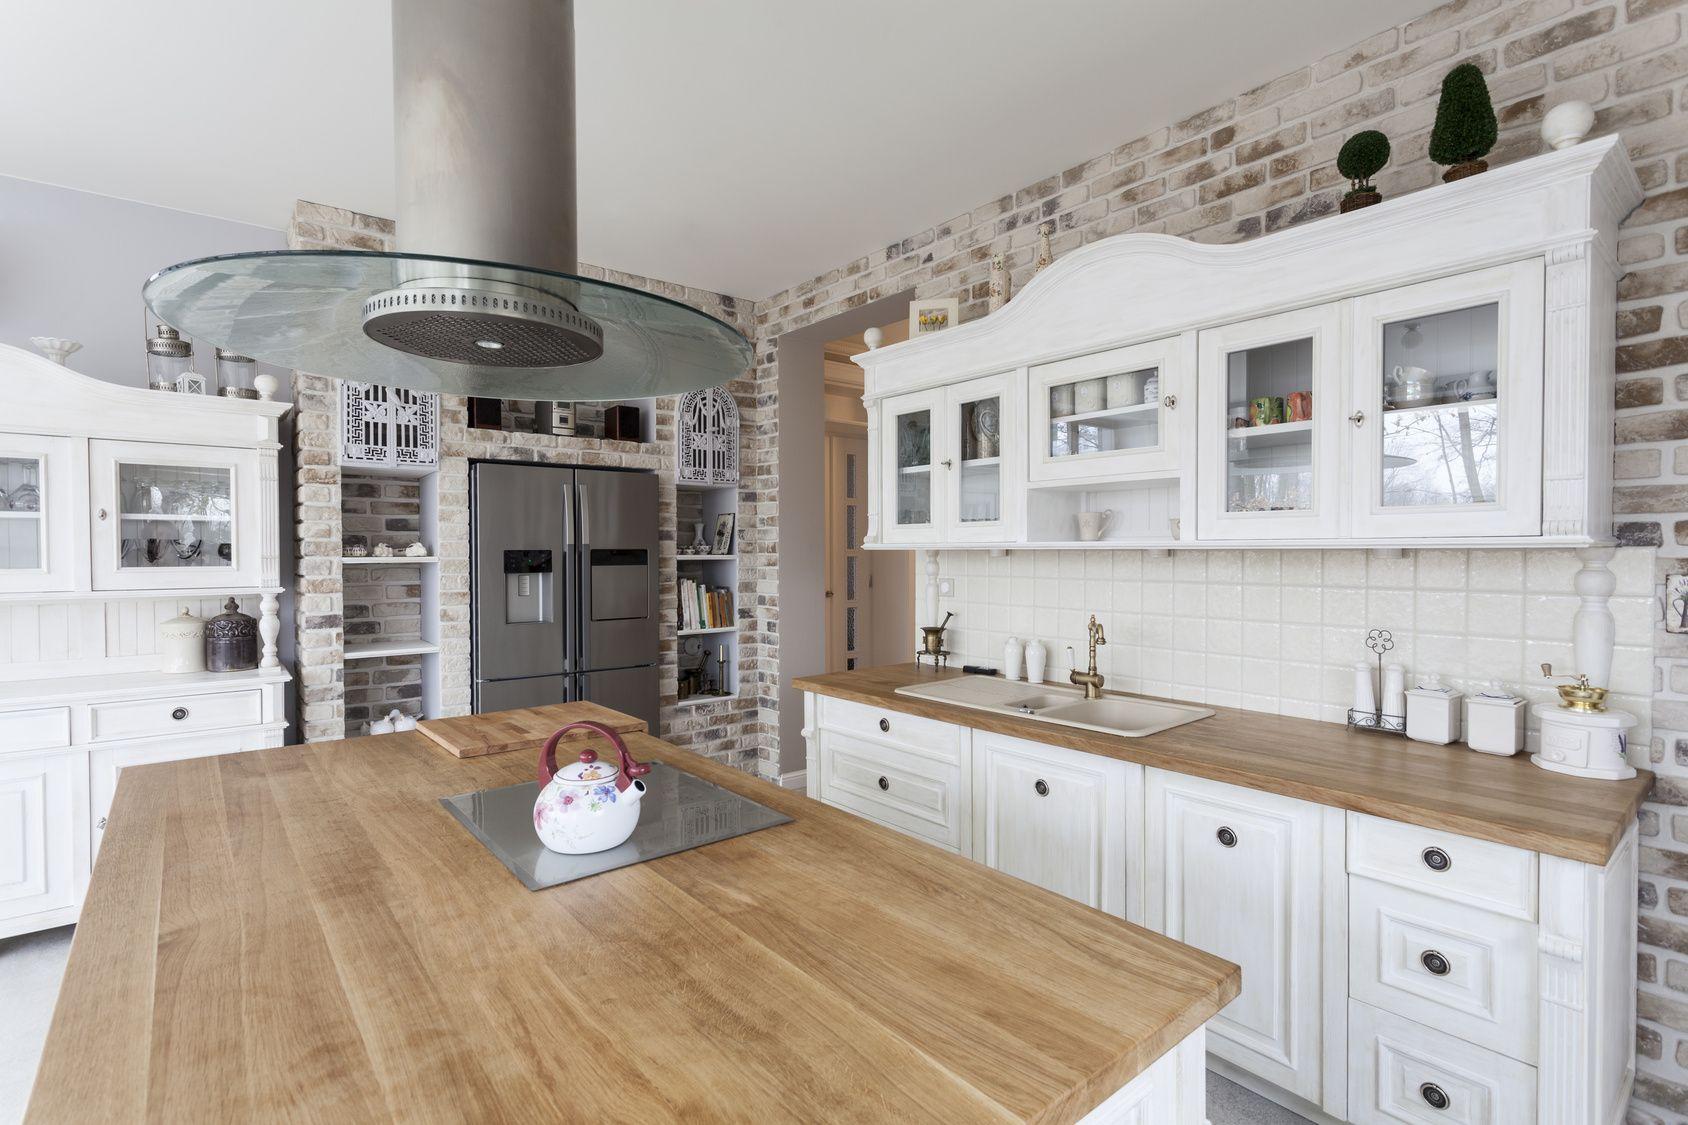 Kücheninsel landhausstil  Moderne Landhausstilküche mit großzügiger Kücheninsel | Landhaus ...